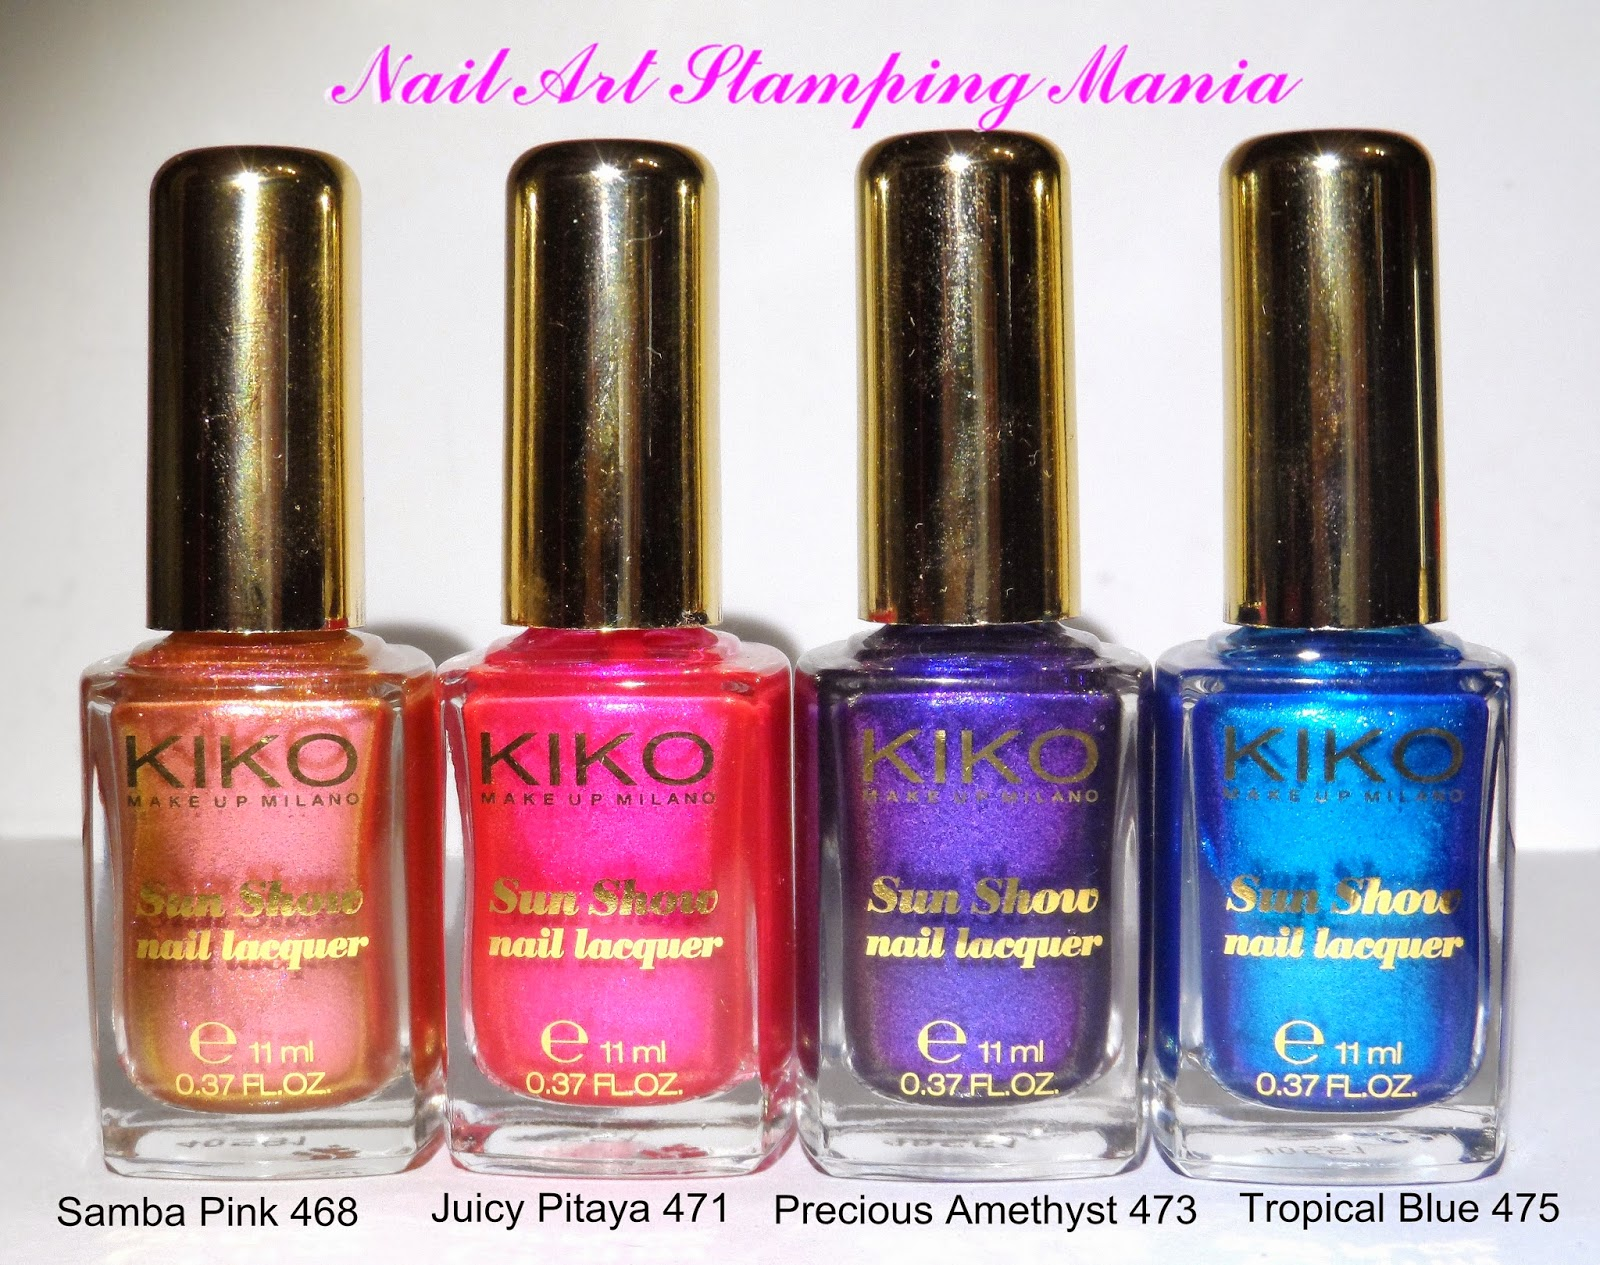 Nail Art Stamping Mania: Kiko SUN SHOW Nail Lacquer Review and Swatches